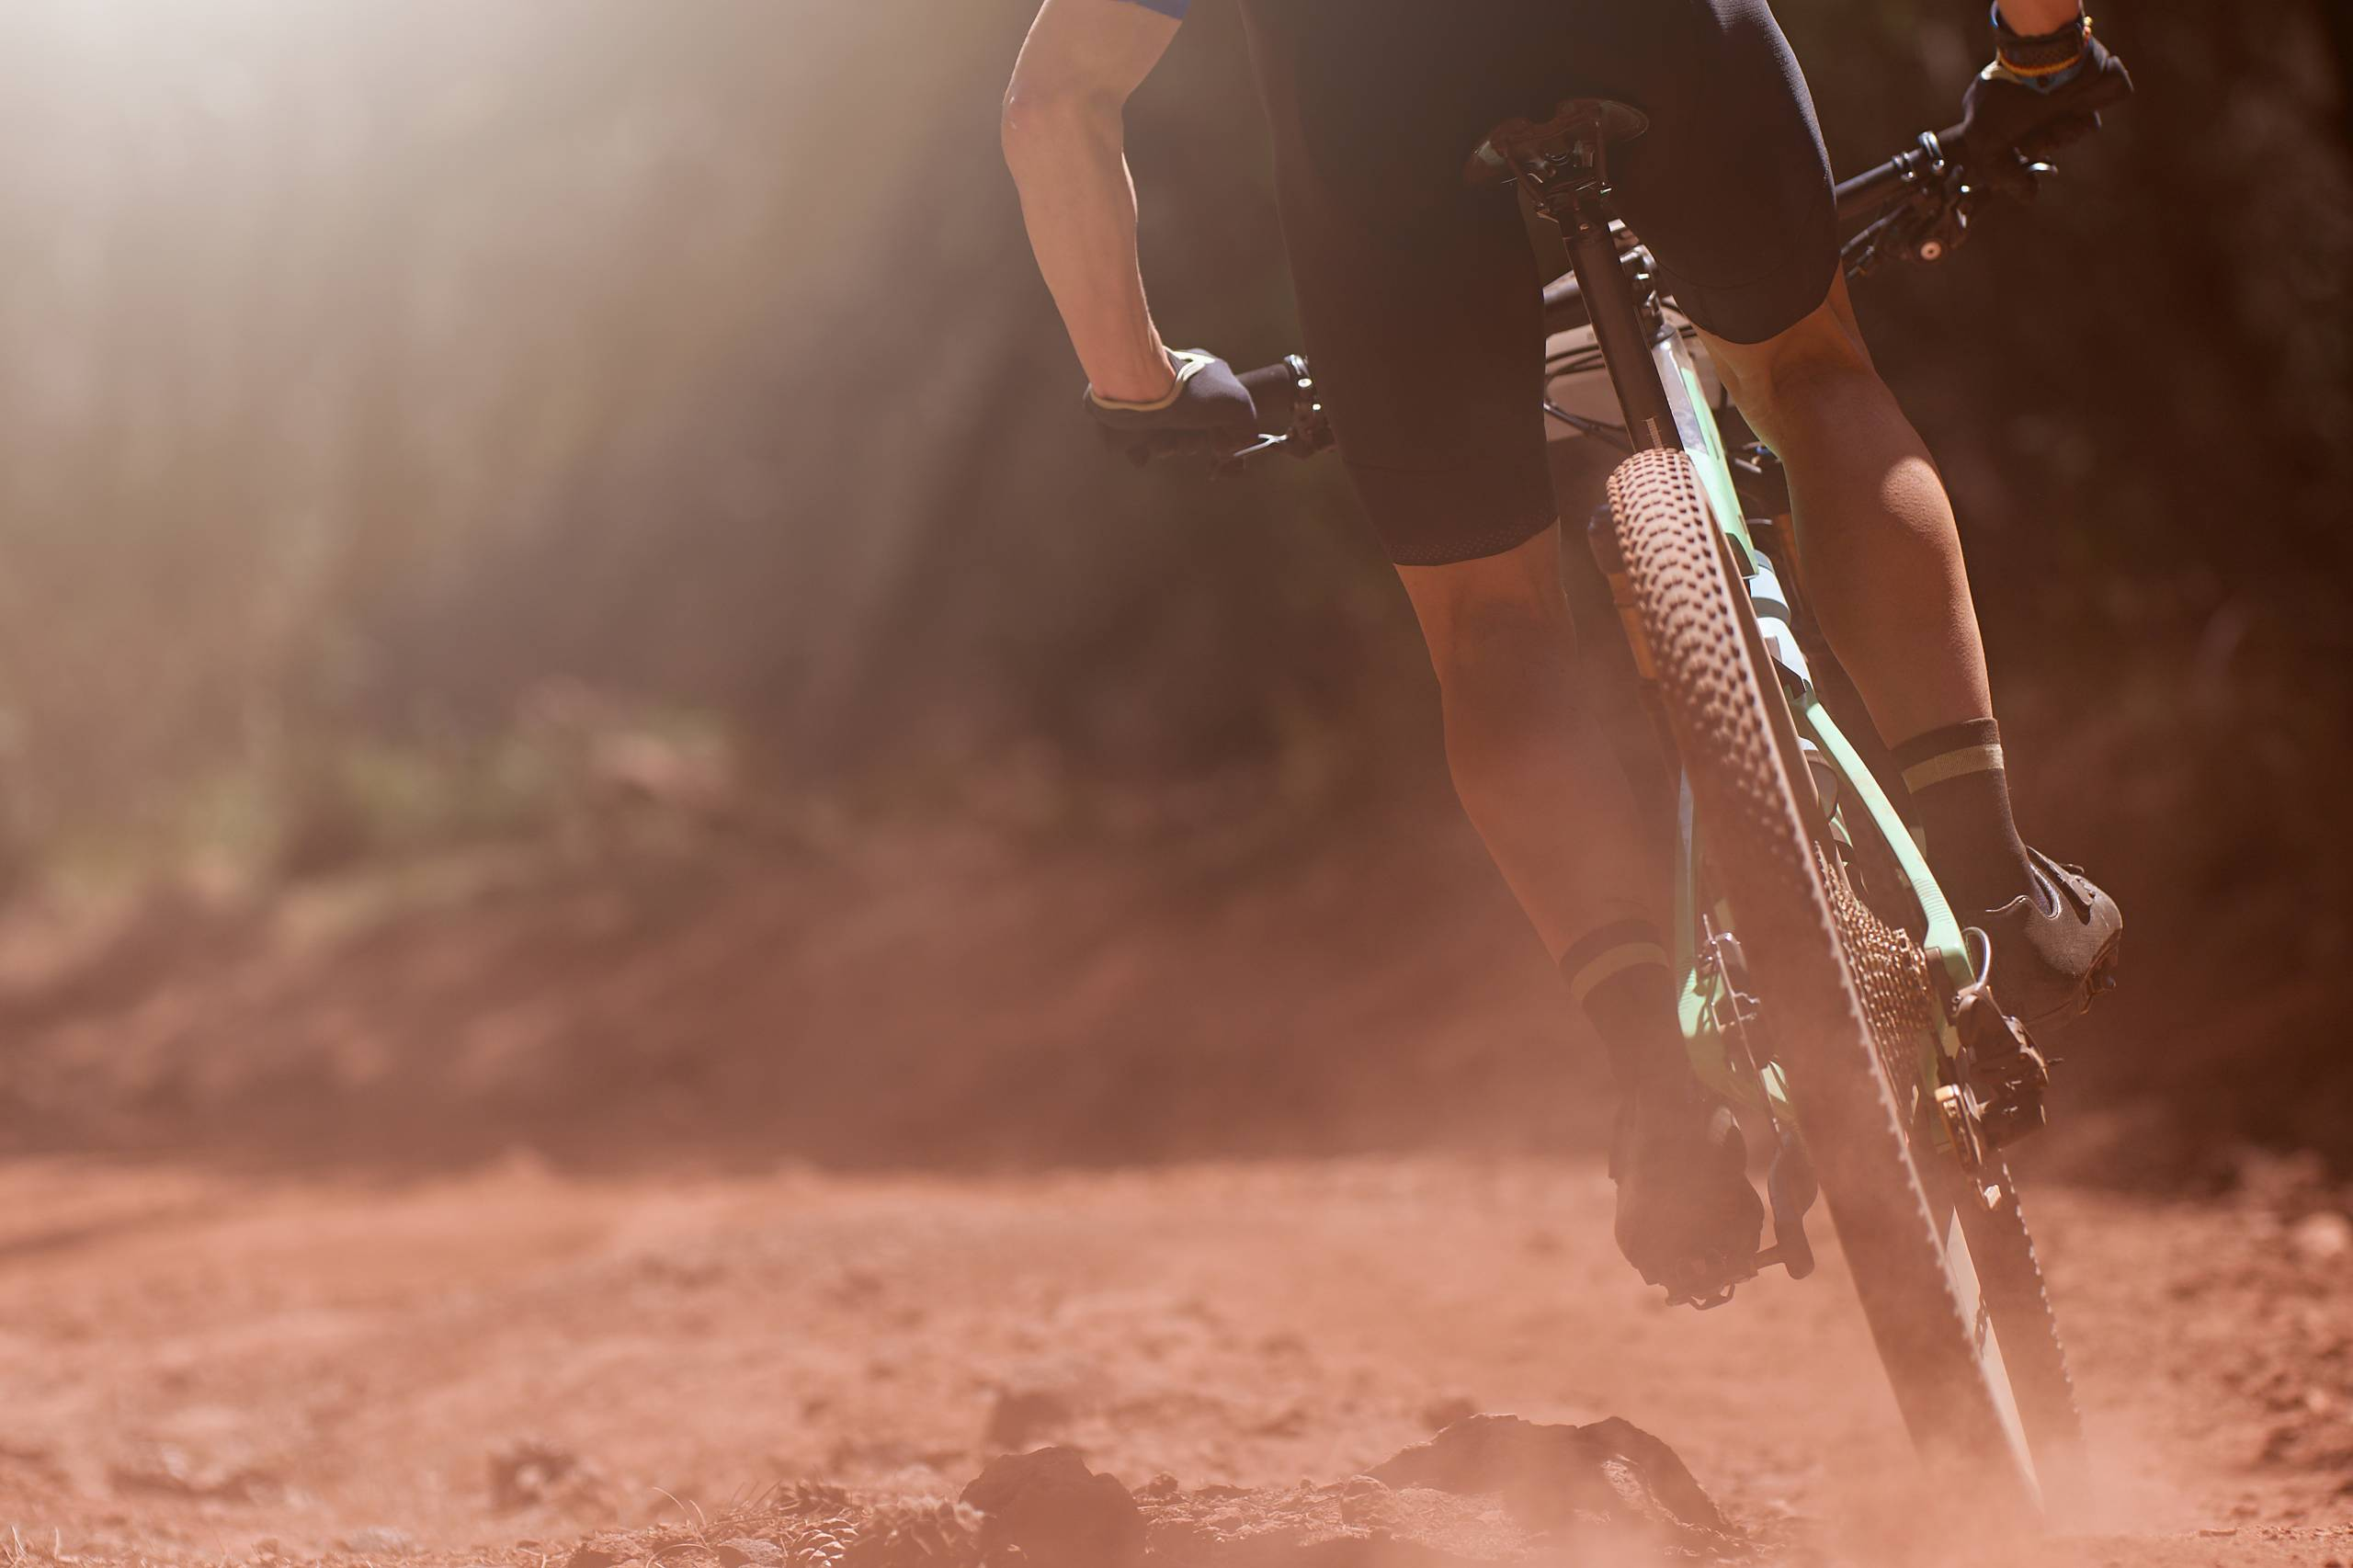 mountain biking right of way